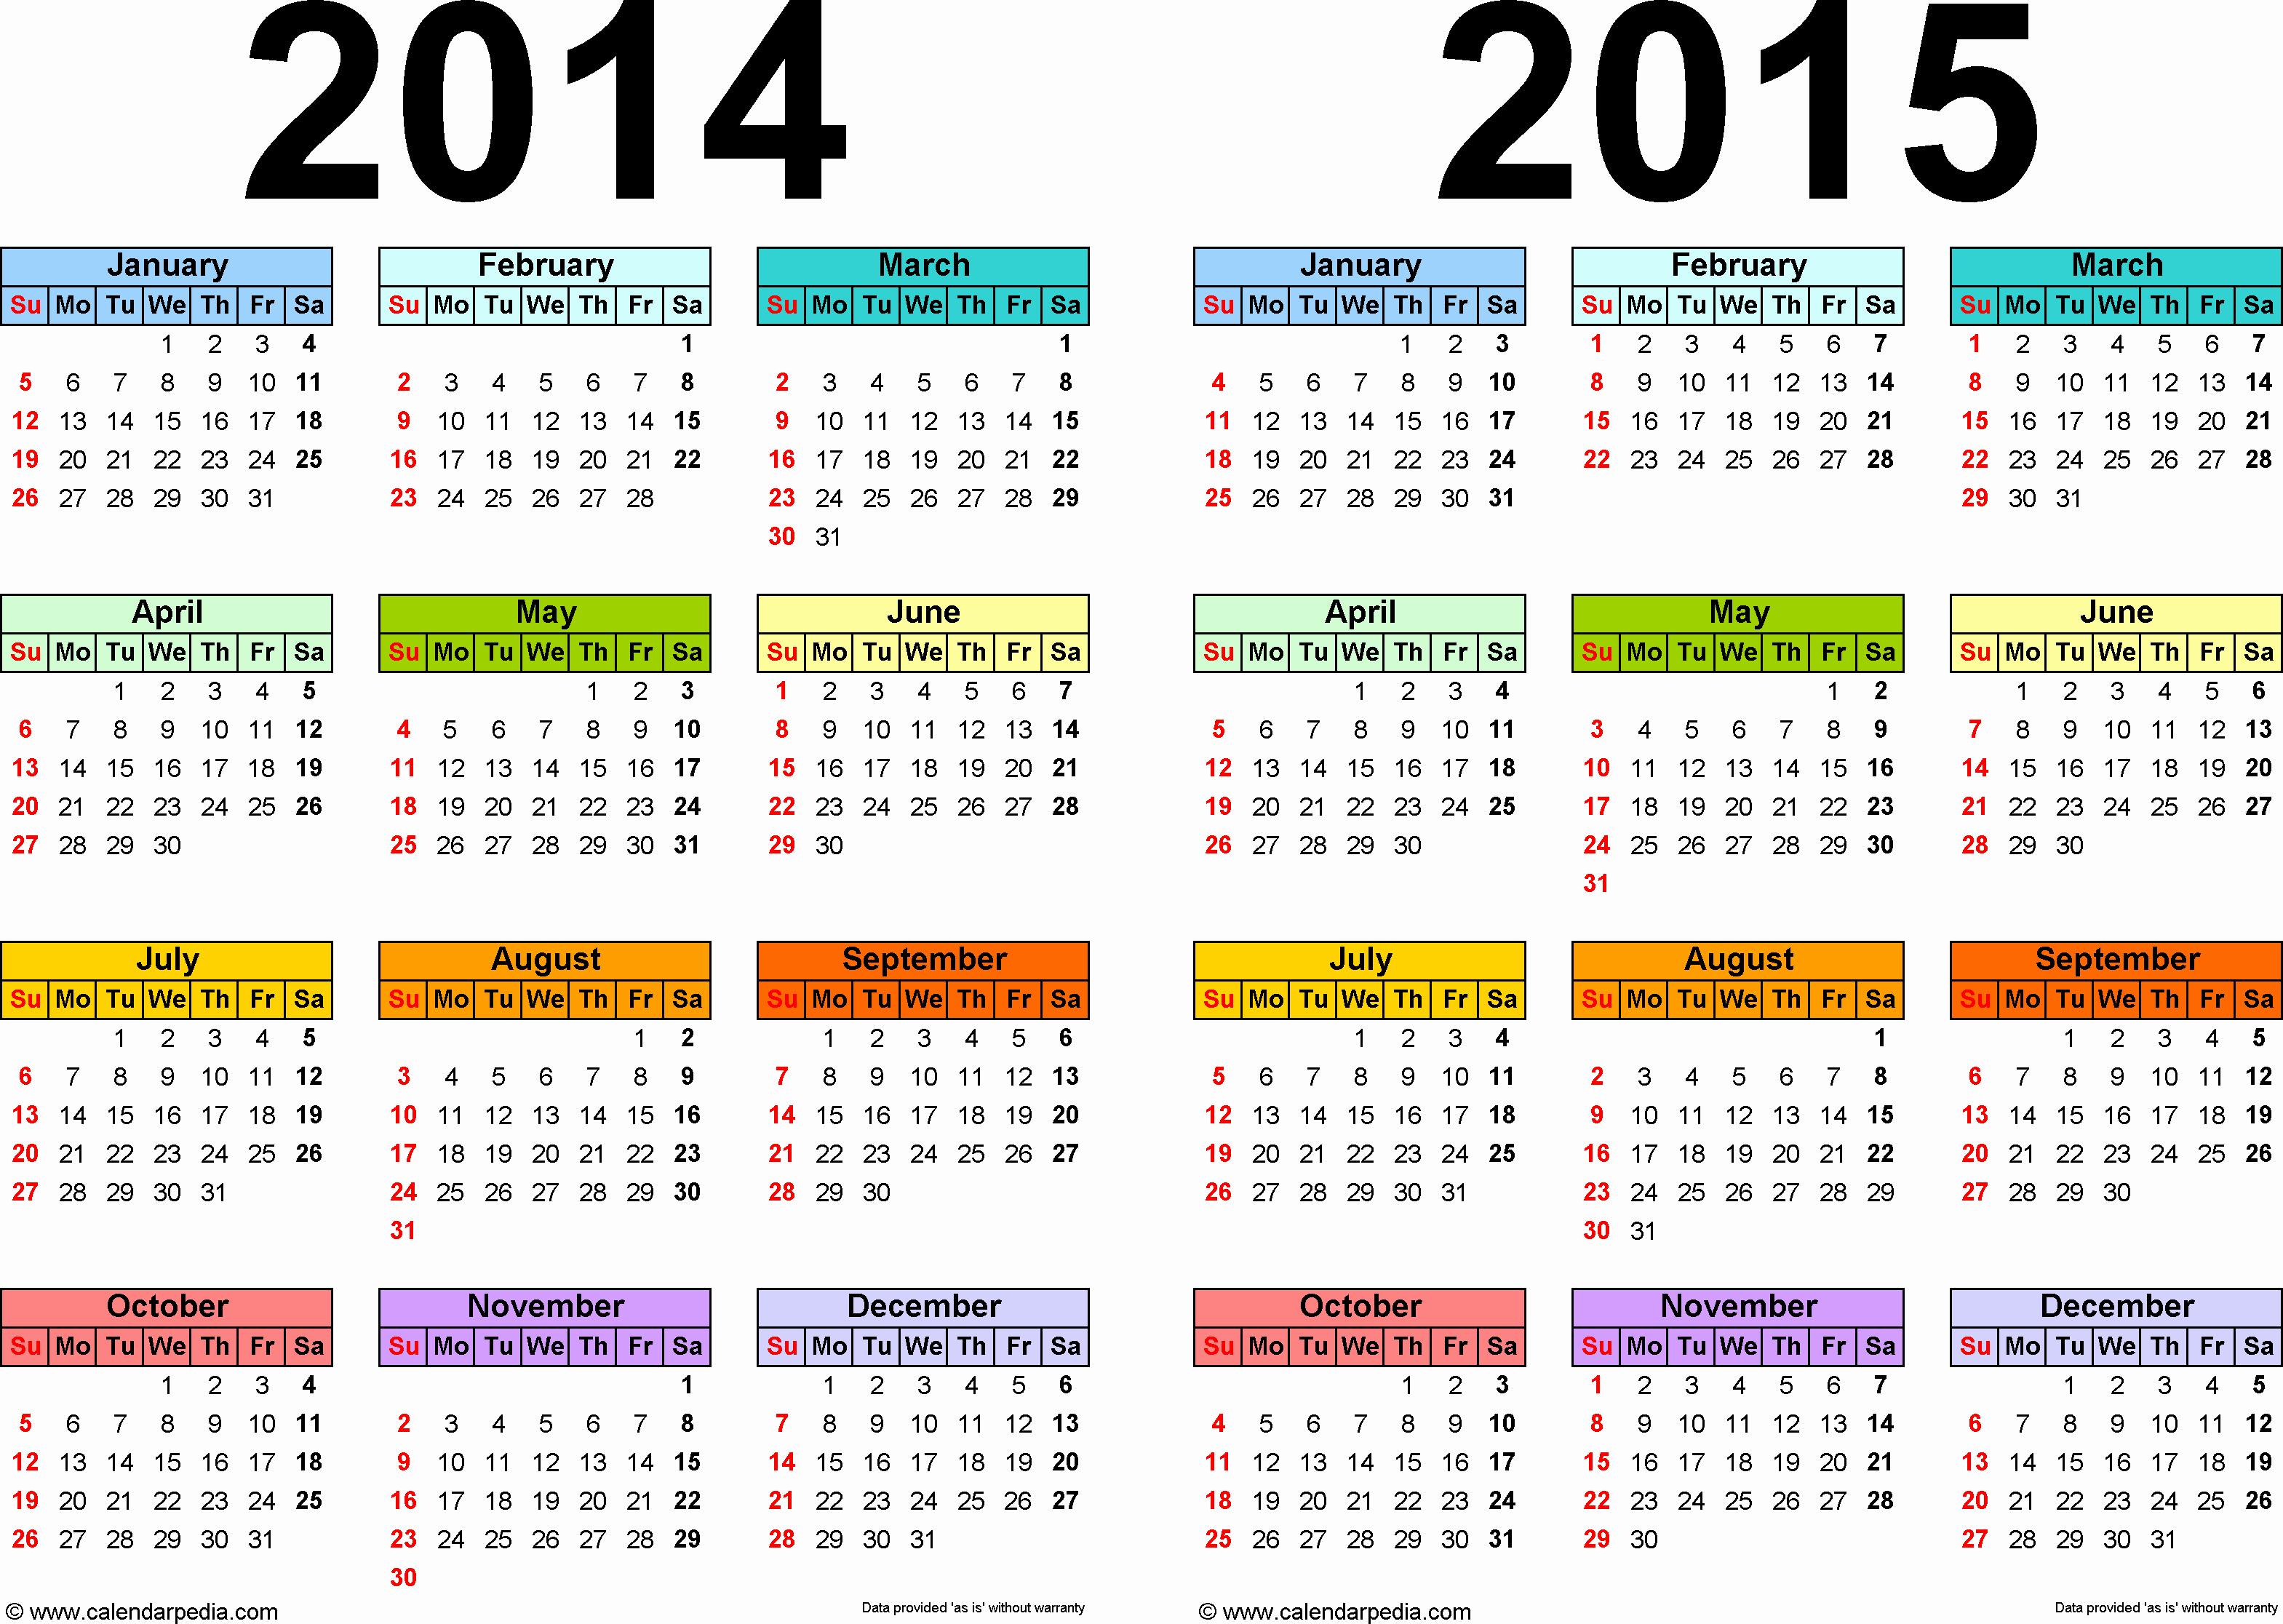 Full Year Calendar Template 2015 Lovely 2014 2015 Calendar Free Printable Two Year Pdf Calendars